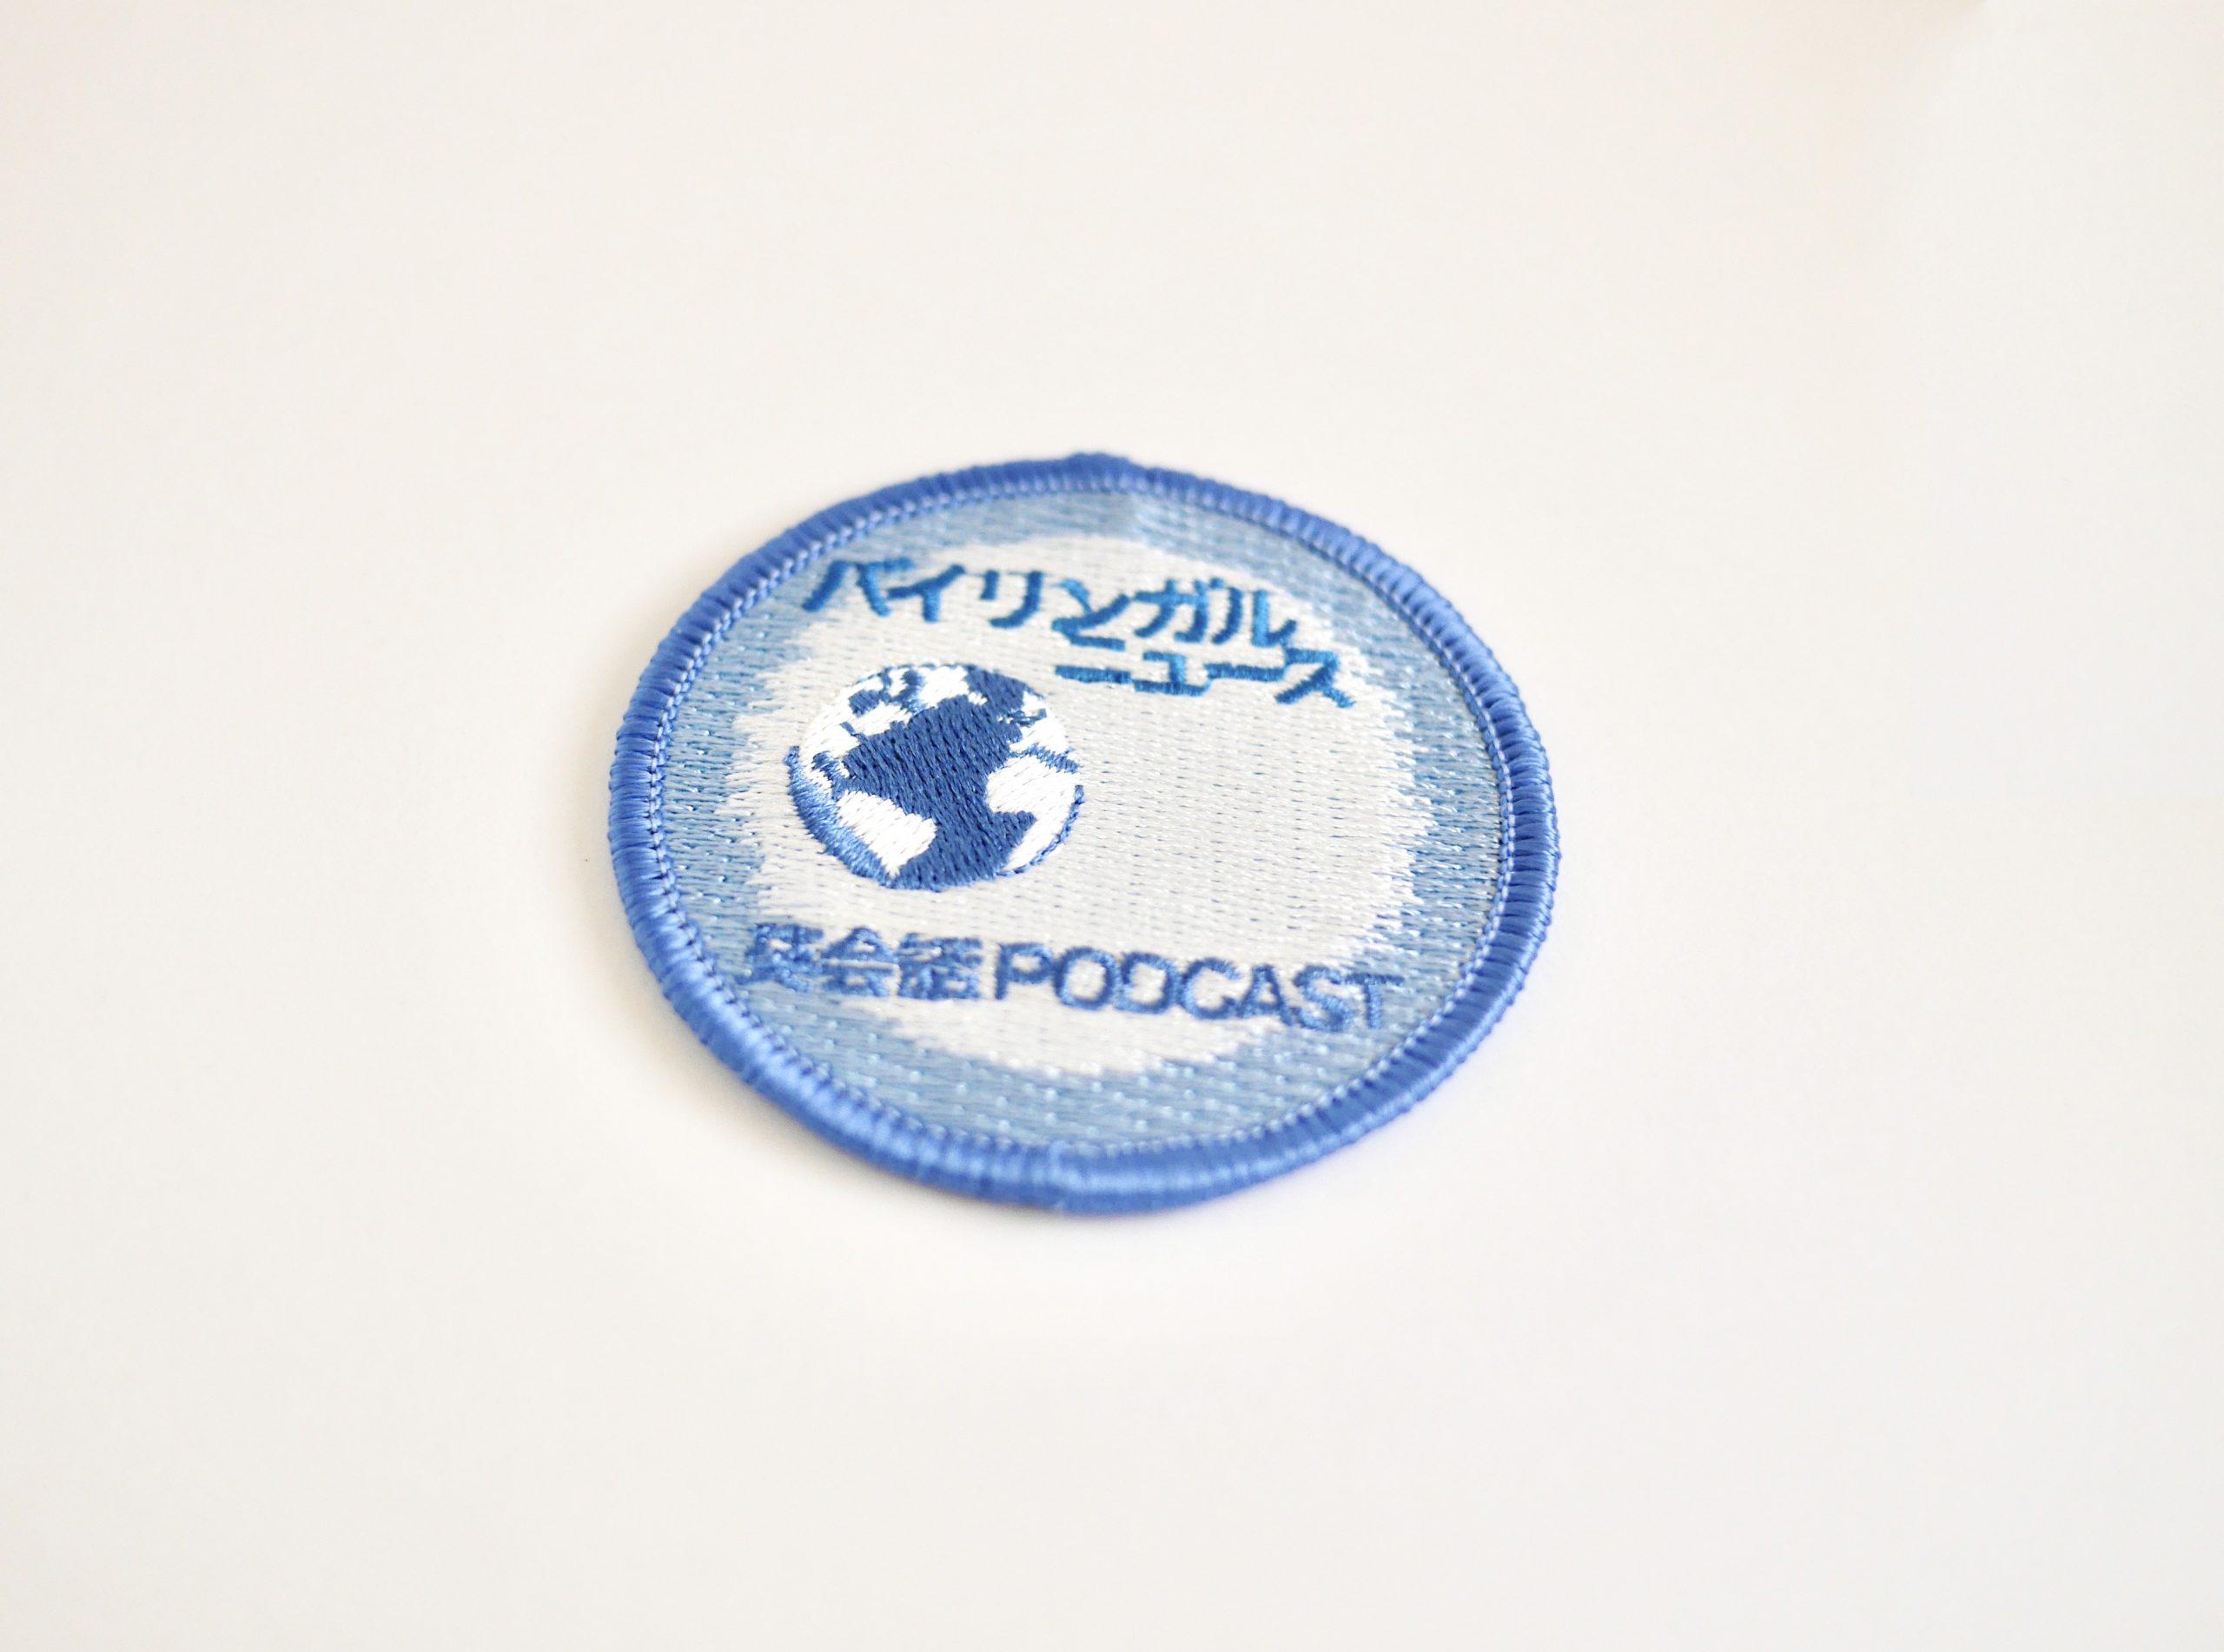 BN Logo Patch | BN ロゴワッペン